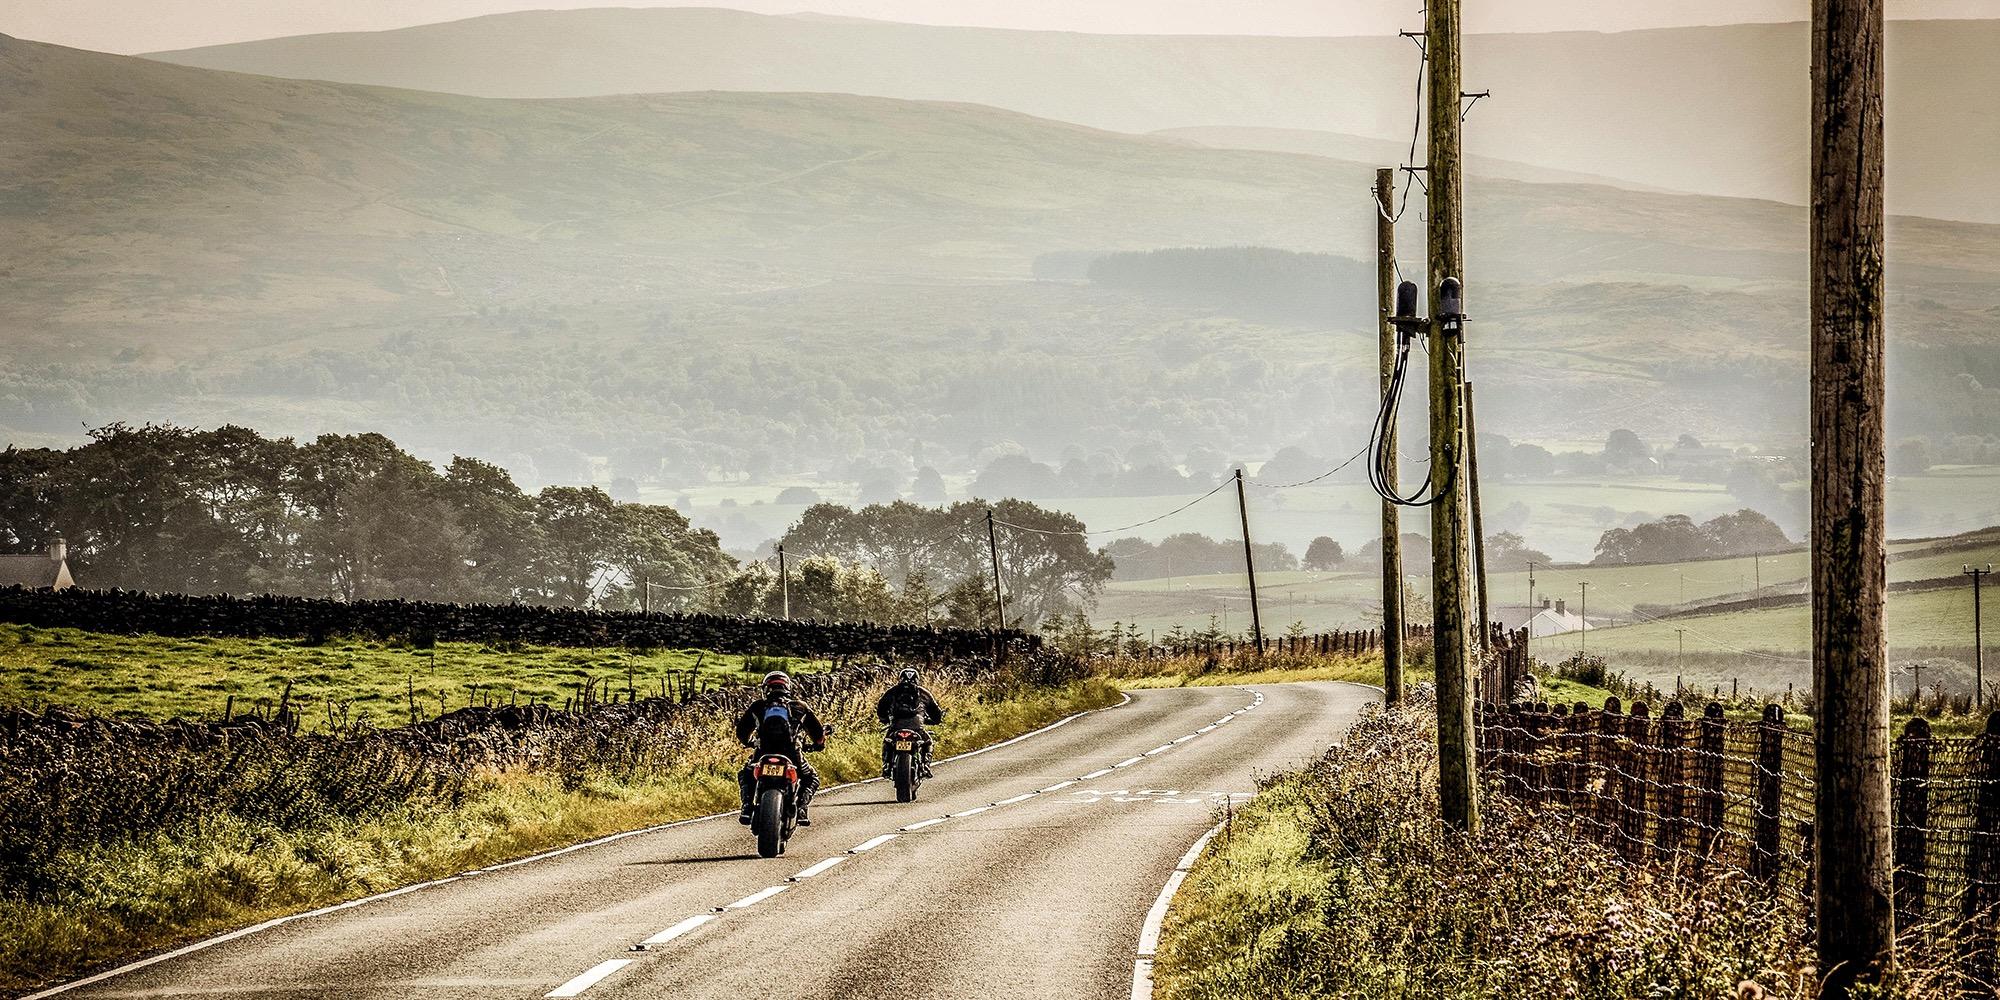 Bike riders on the road